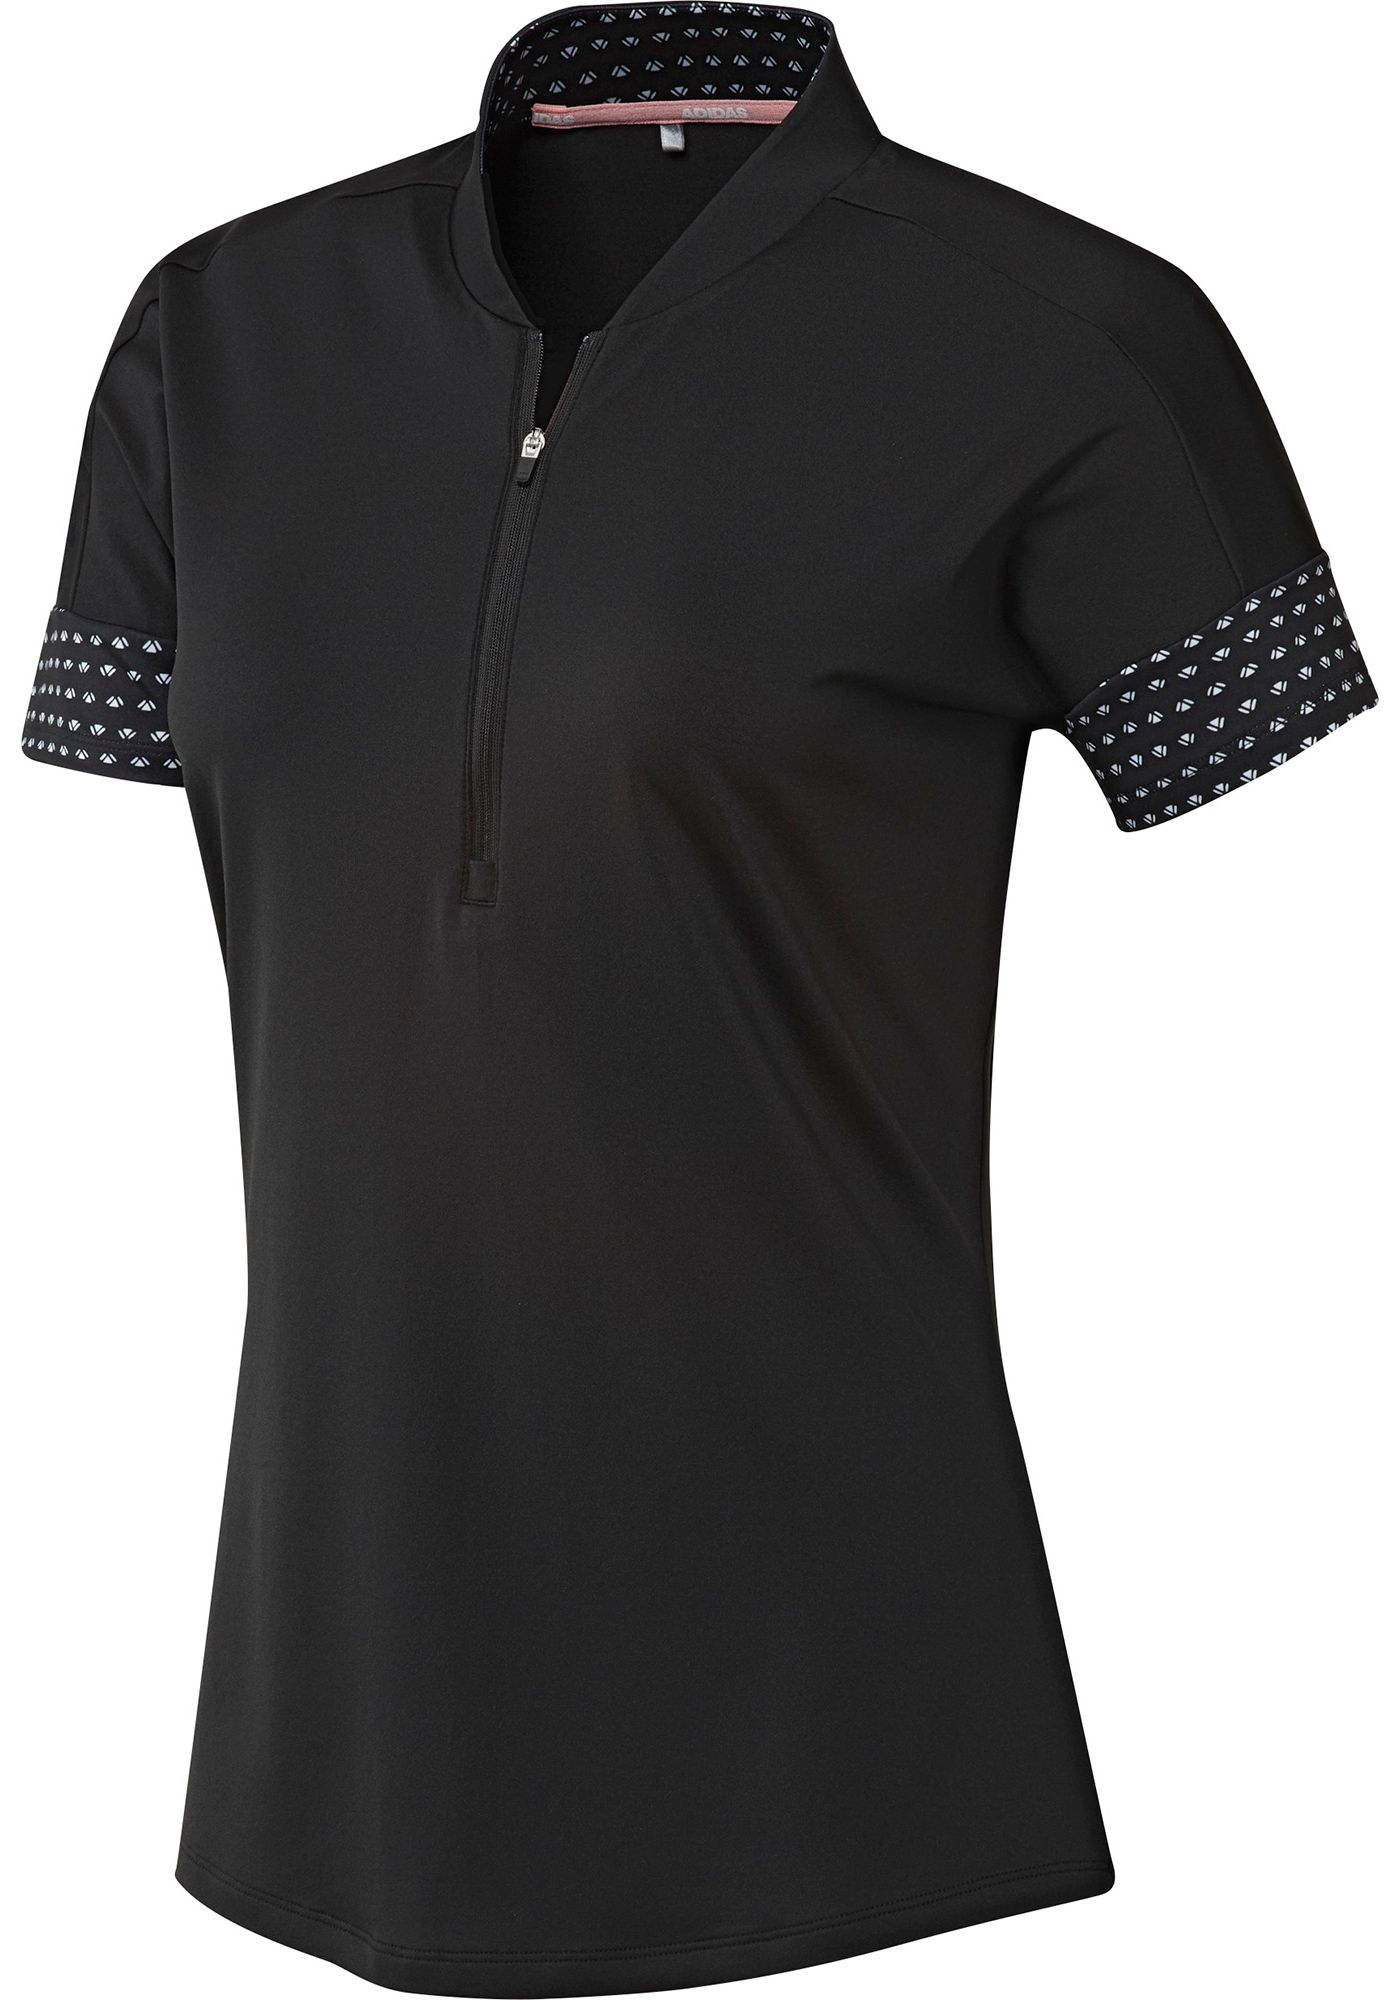 adidas Women's Ultimate365 Printed Short Sleeve Golf Polo